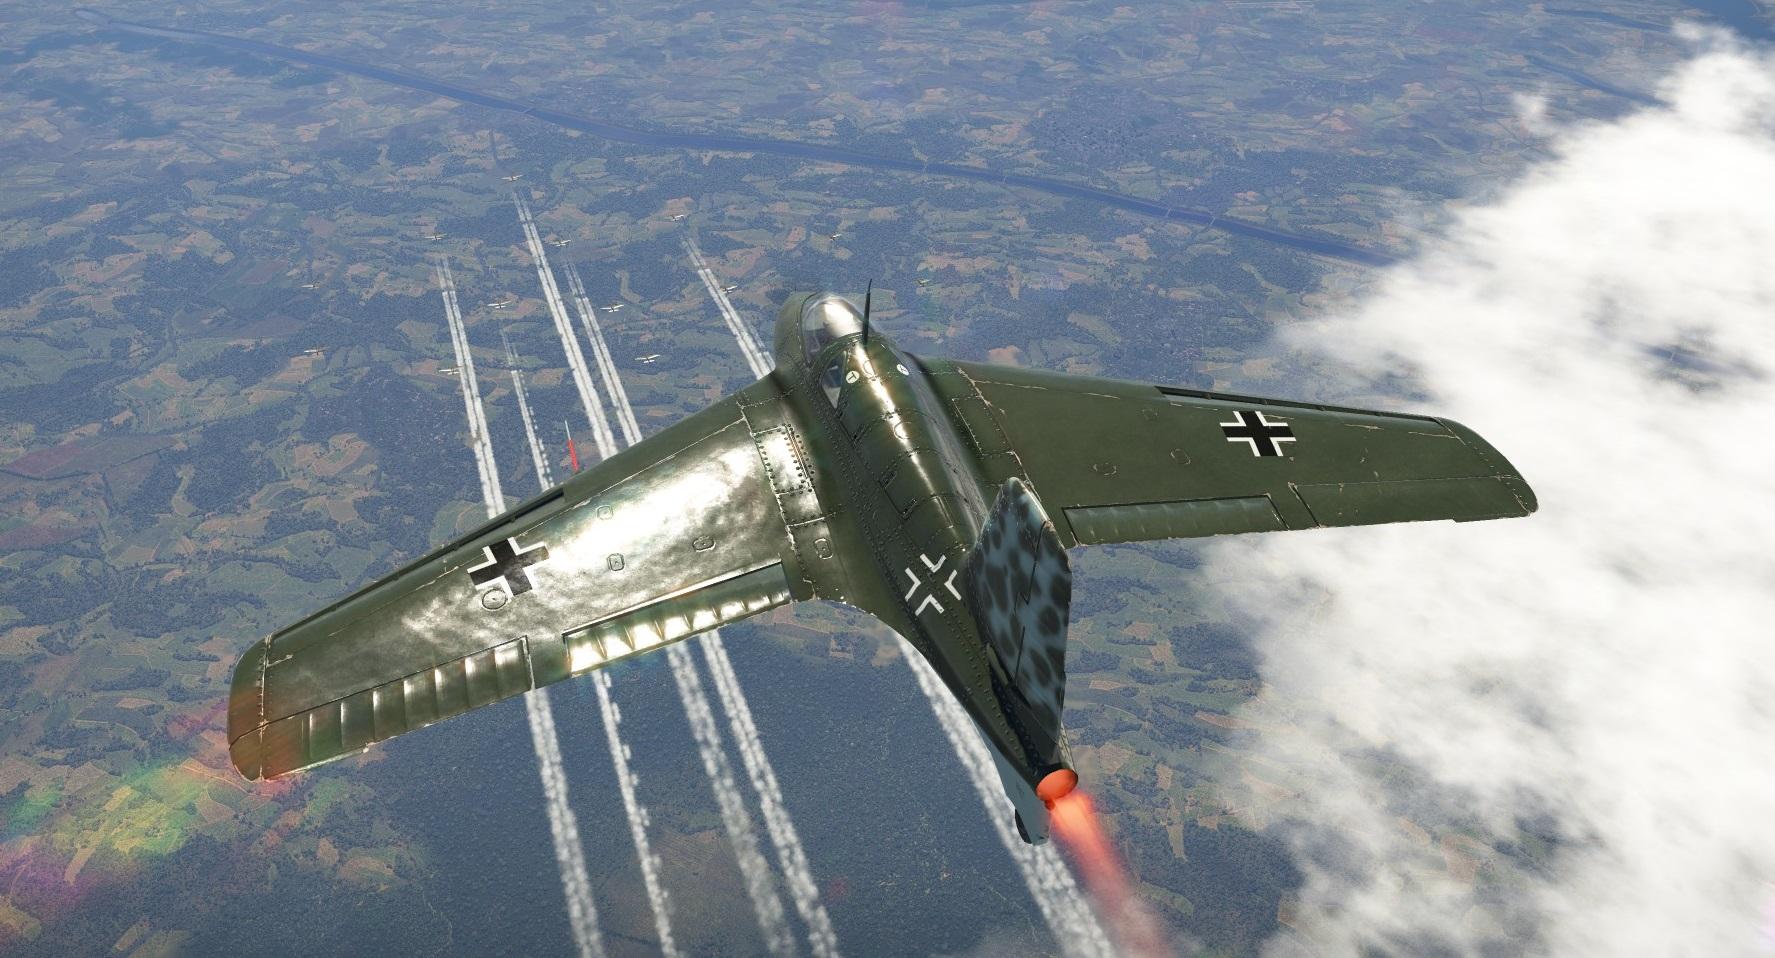 Hitler's Secret Weapon: Meet Nazi Germany's Me 163 (A Rocket-Powered